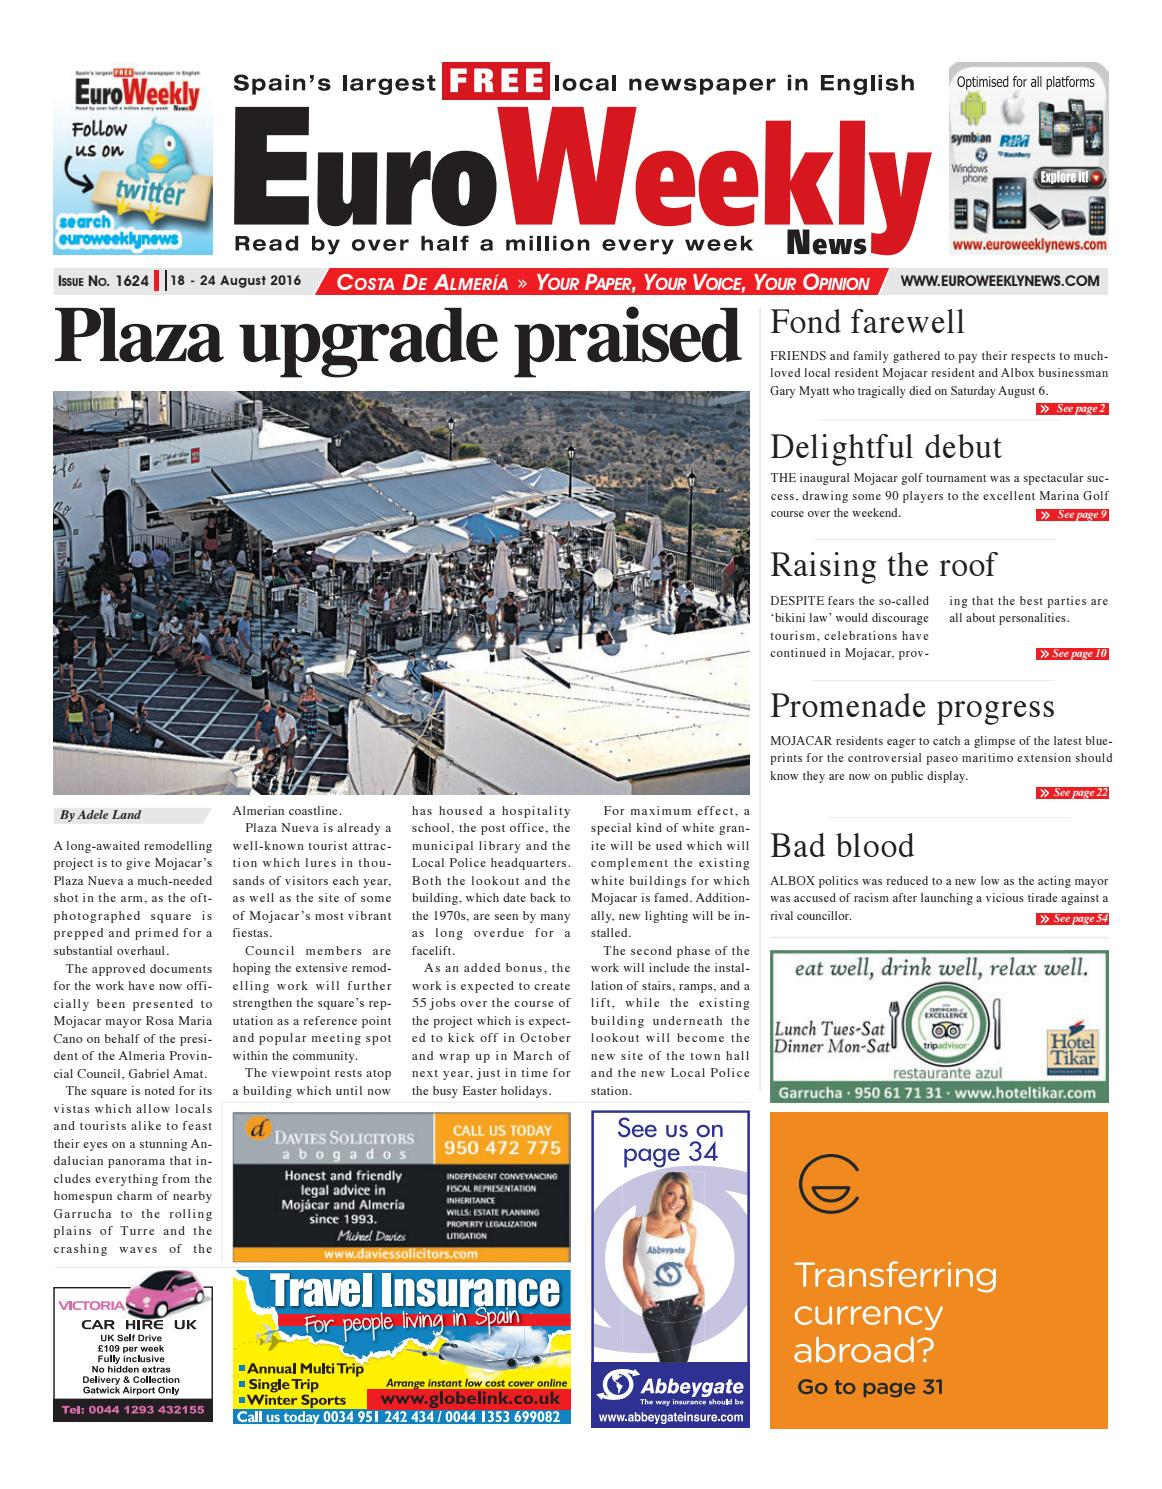 Euro weekly news costa de almeria 18 24 august 2016 issue 1624 euro weekly news costa de almeria 18 24 august 2016 issue 1624 by euro weekly news media sa issuu fandeluxe Choice Image